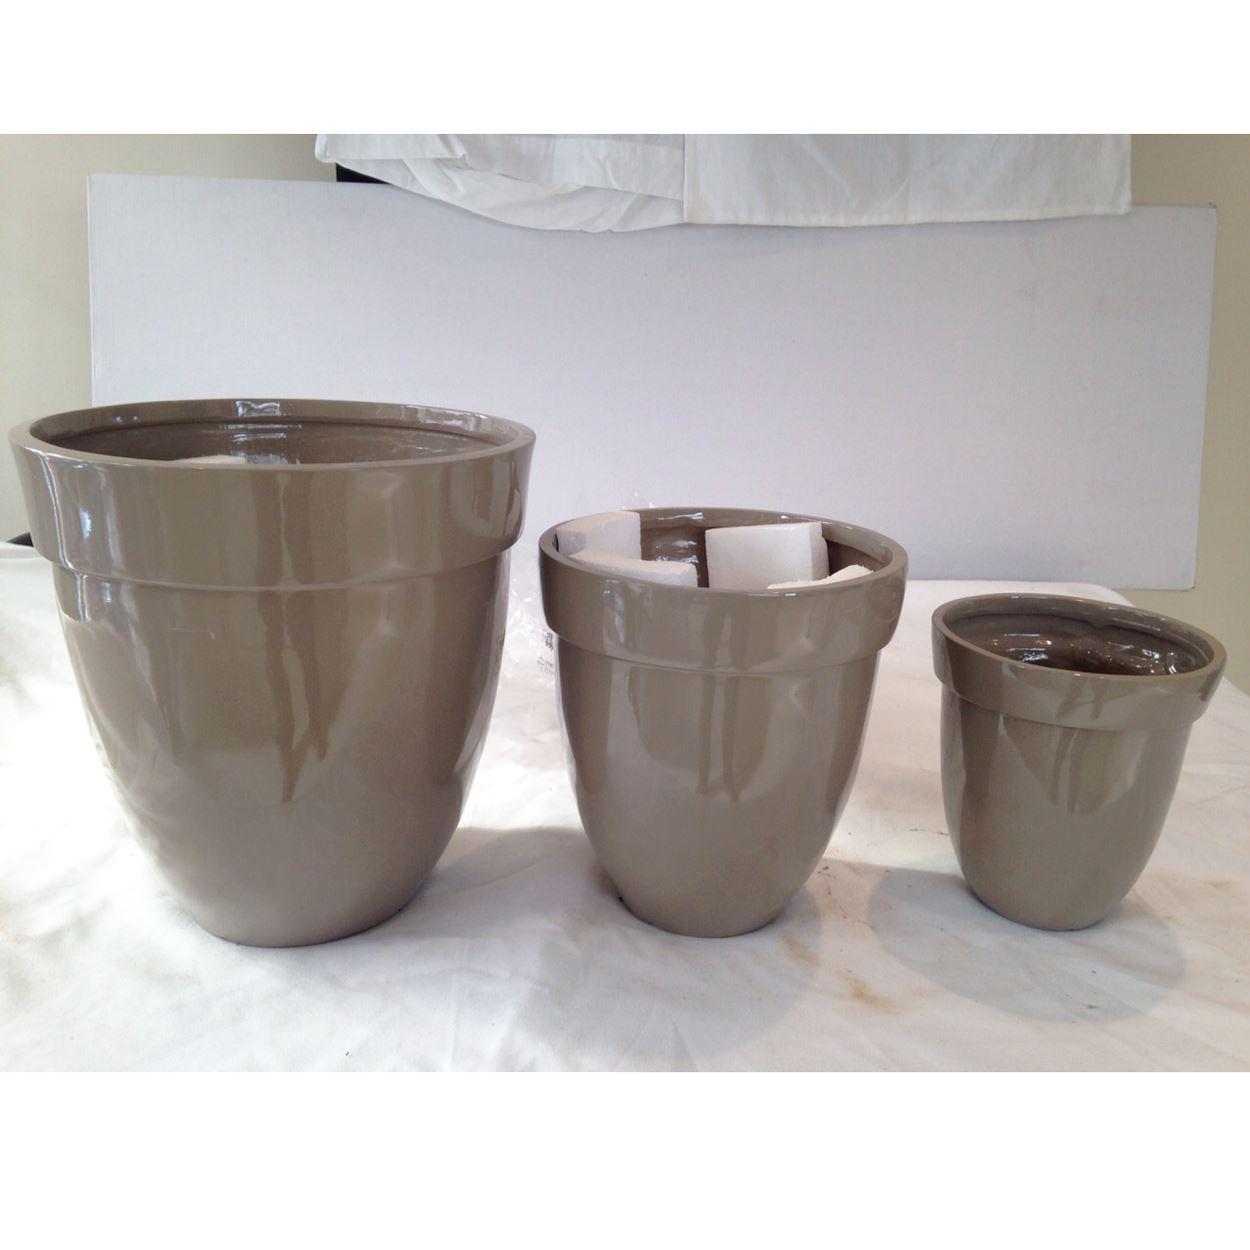 Kitchen Garden Pots: EGG SHAPE FIBER GLASS POT PLANTER CONTAINER DISPLAY FLOWER